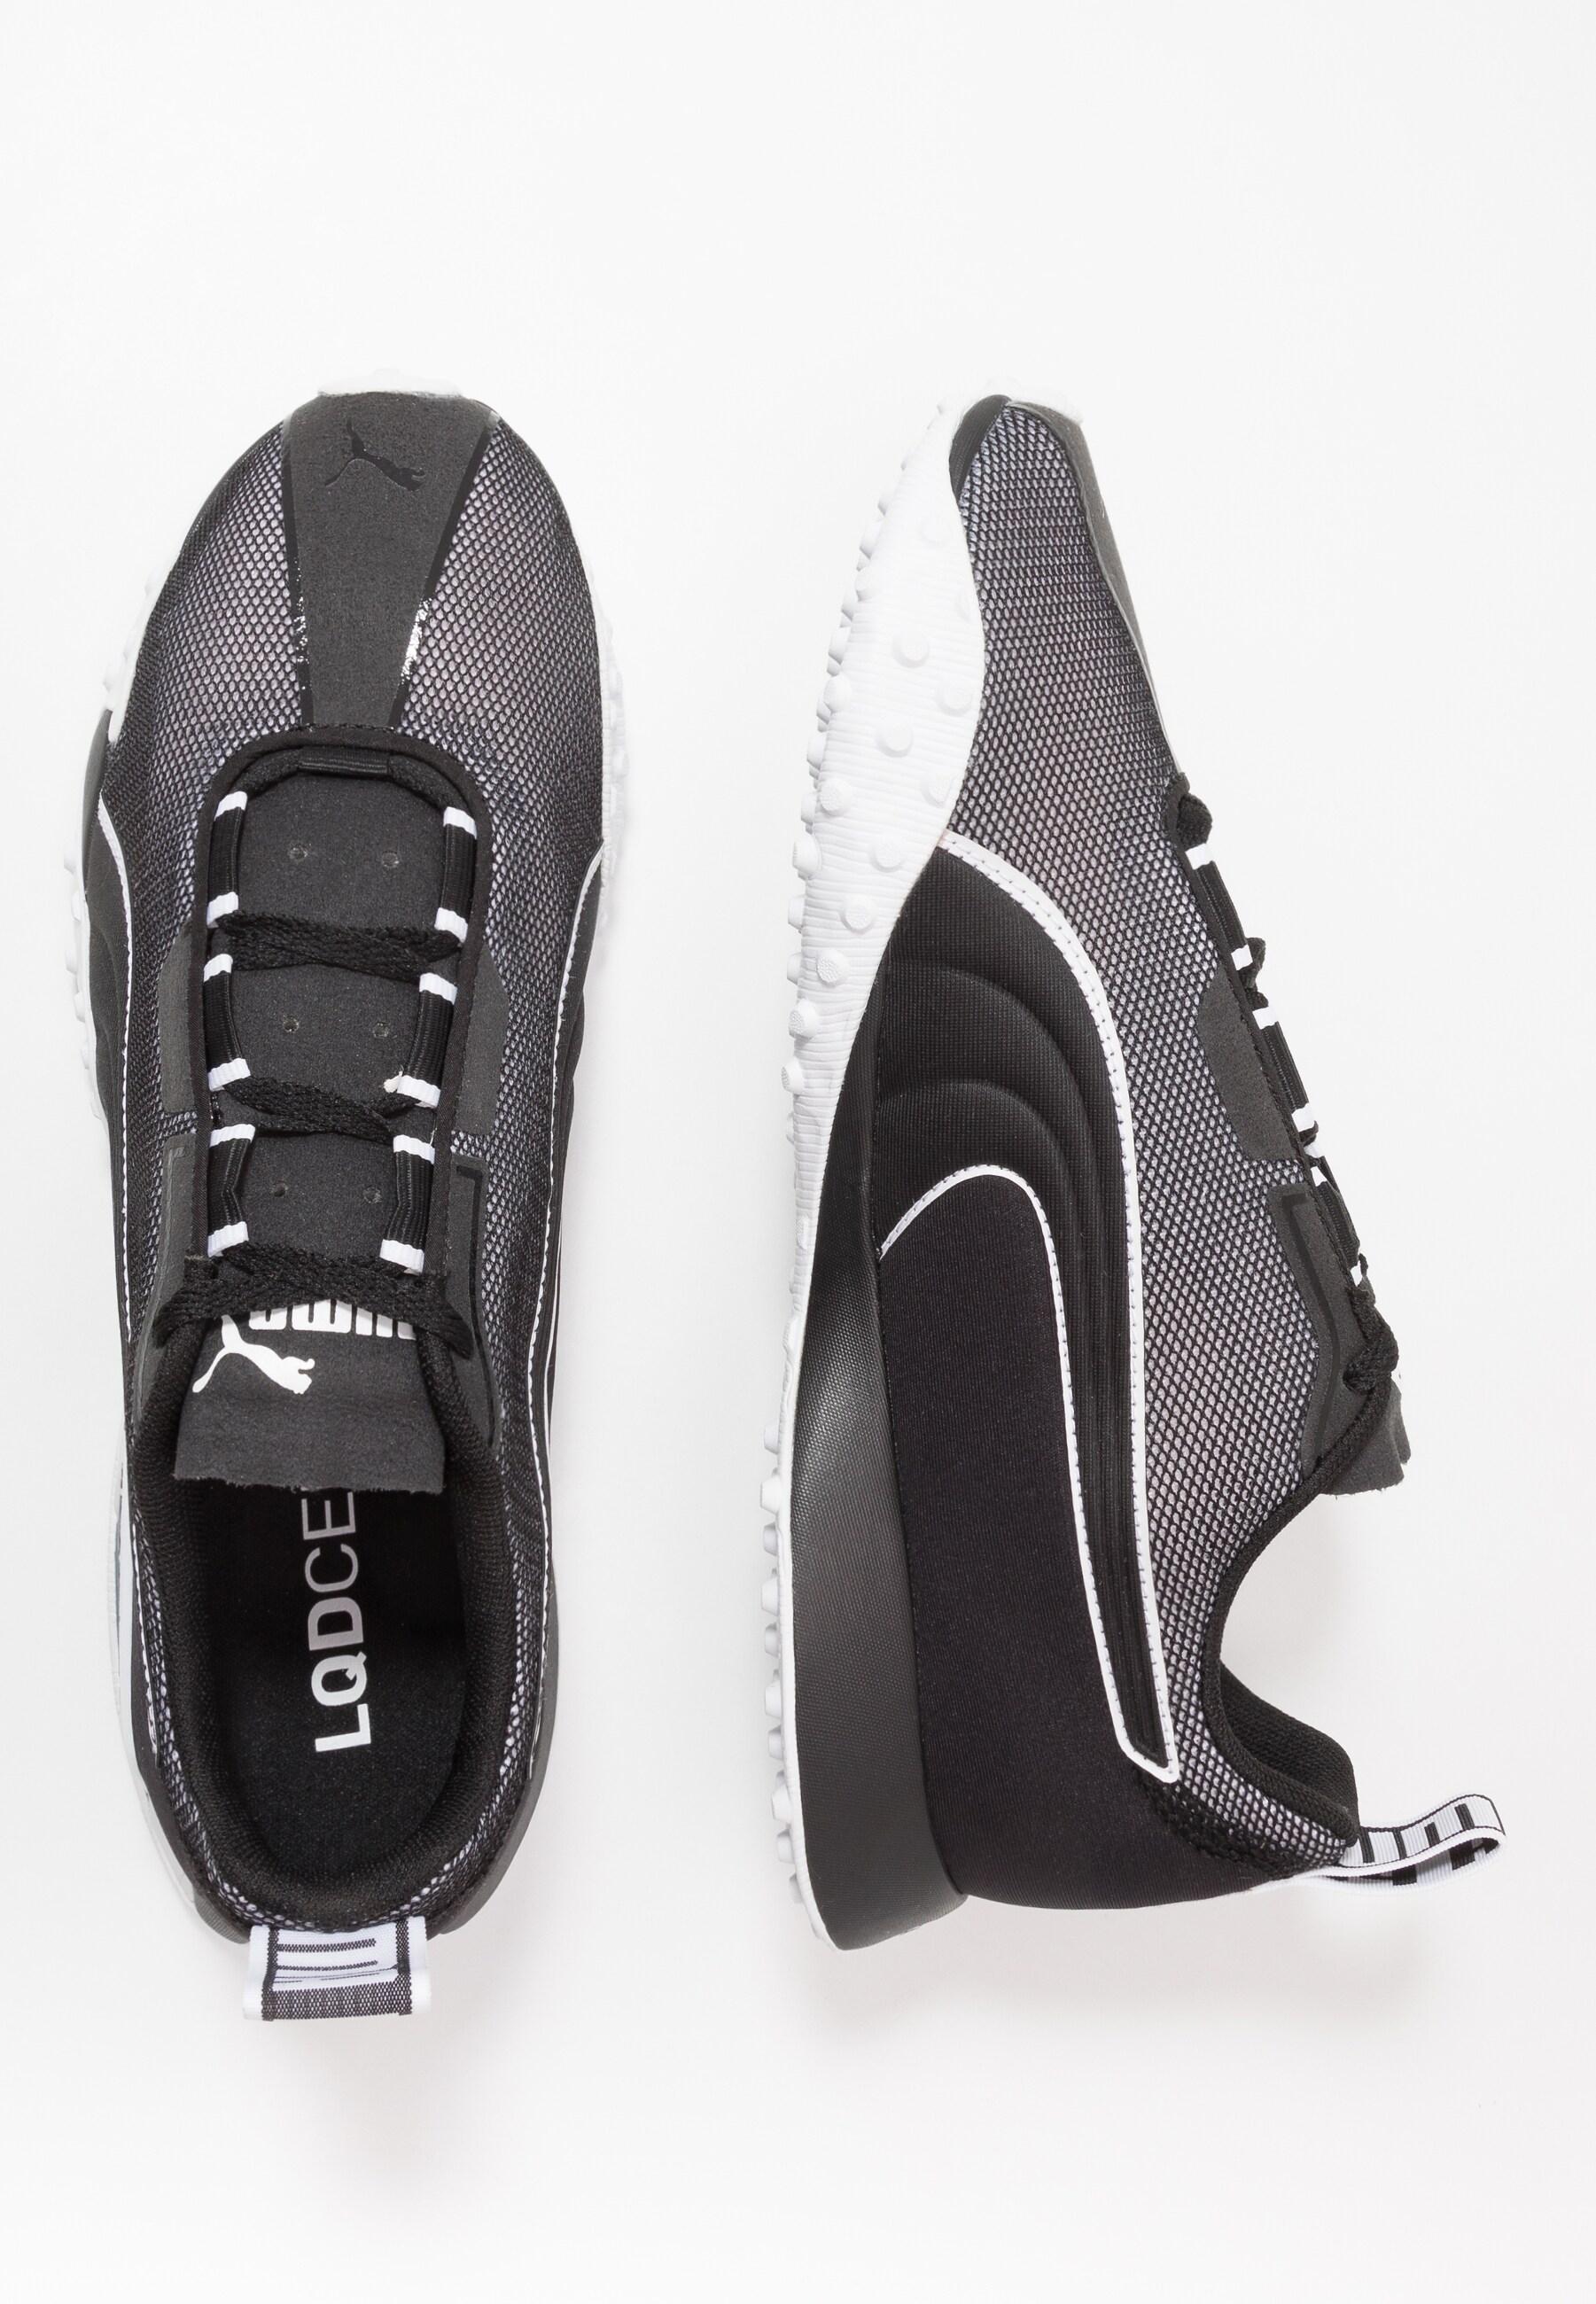 Men's, Puma H.ST.20 - Neutral running shoes - £39.95 delivered @ Zalando